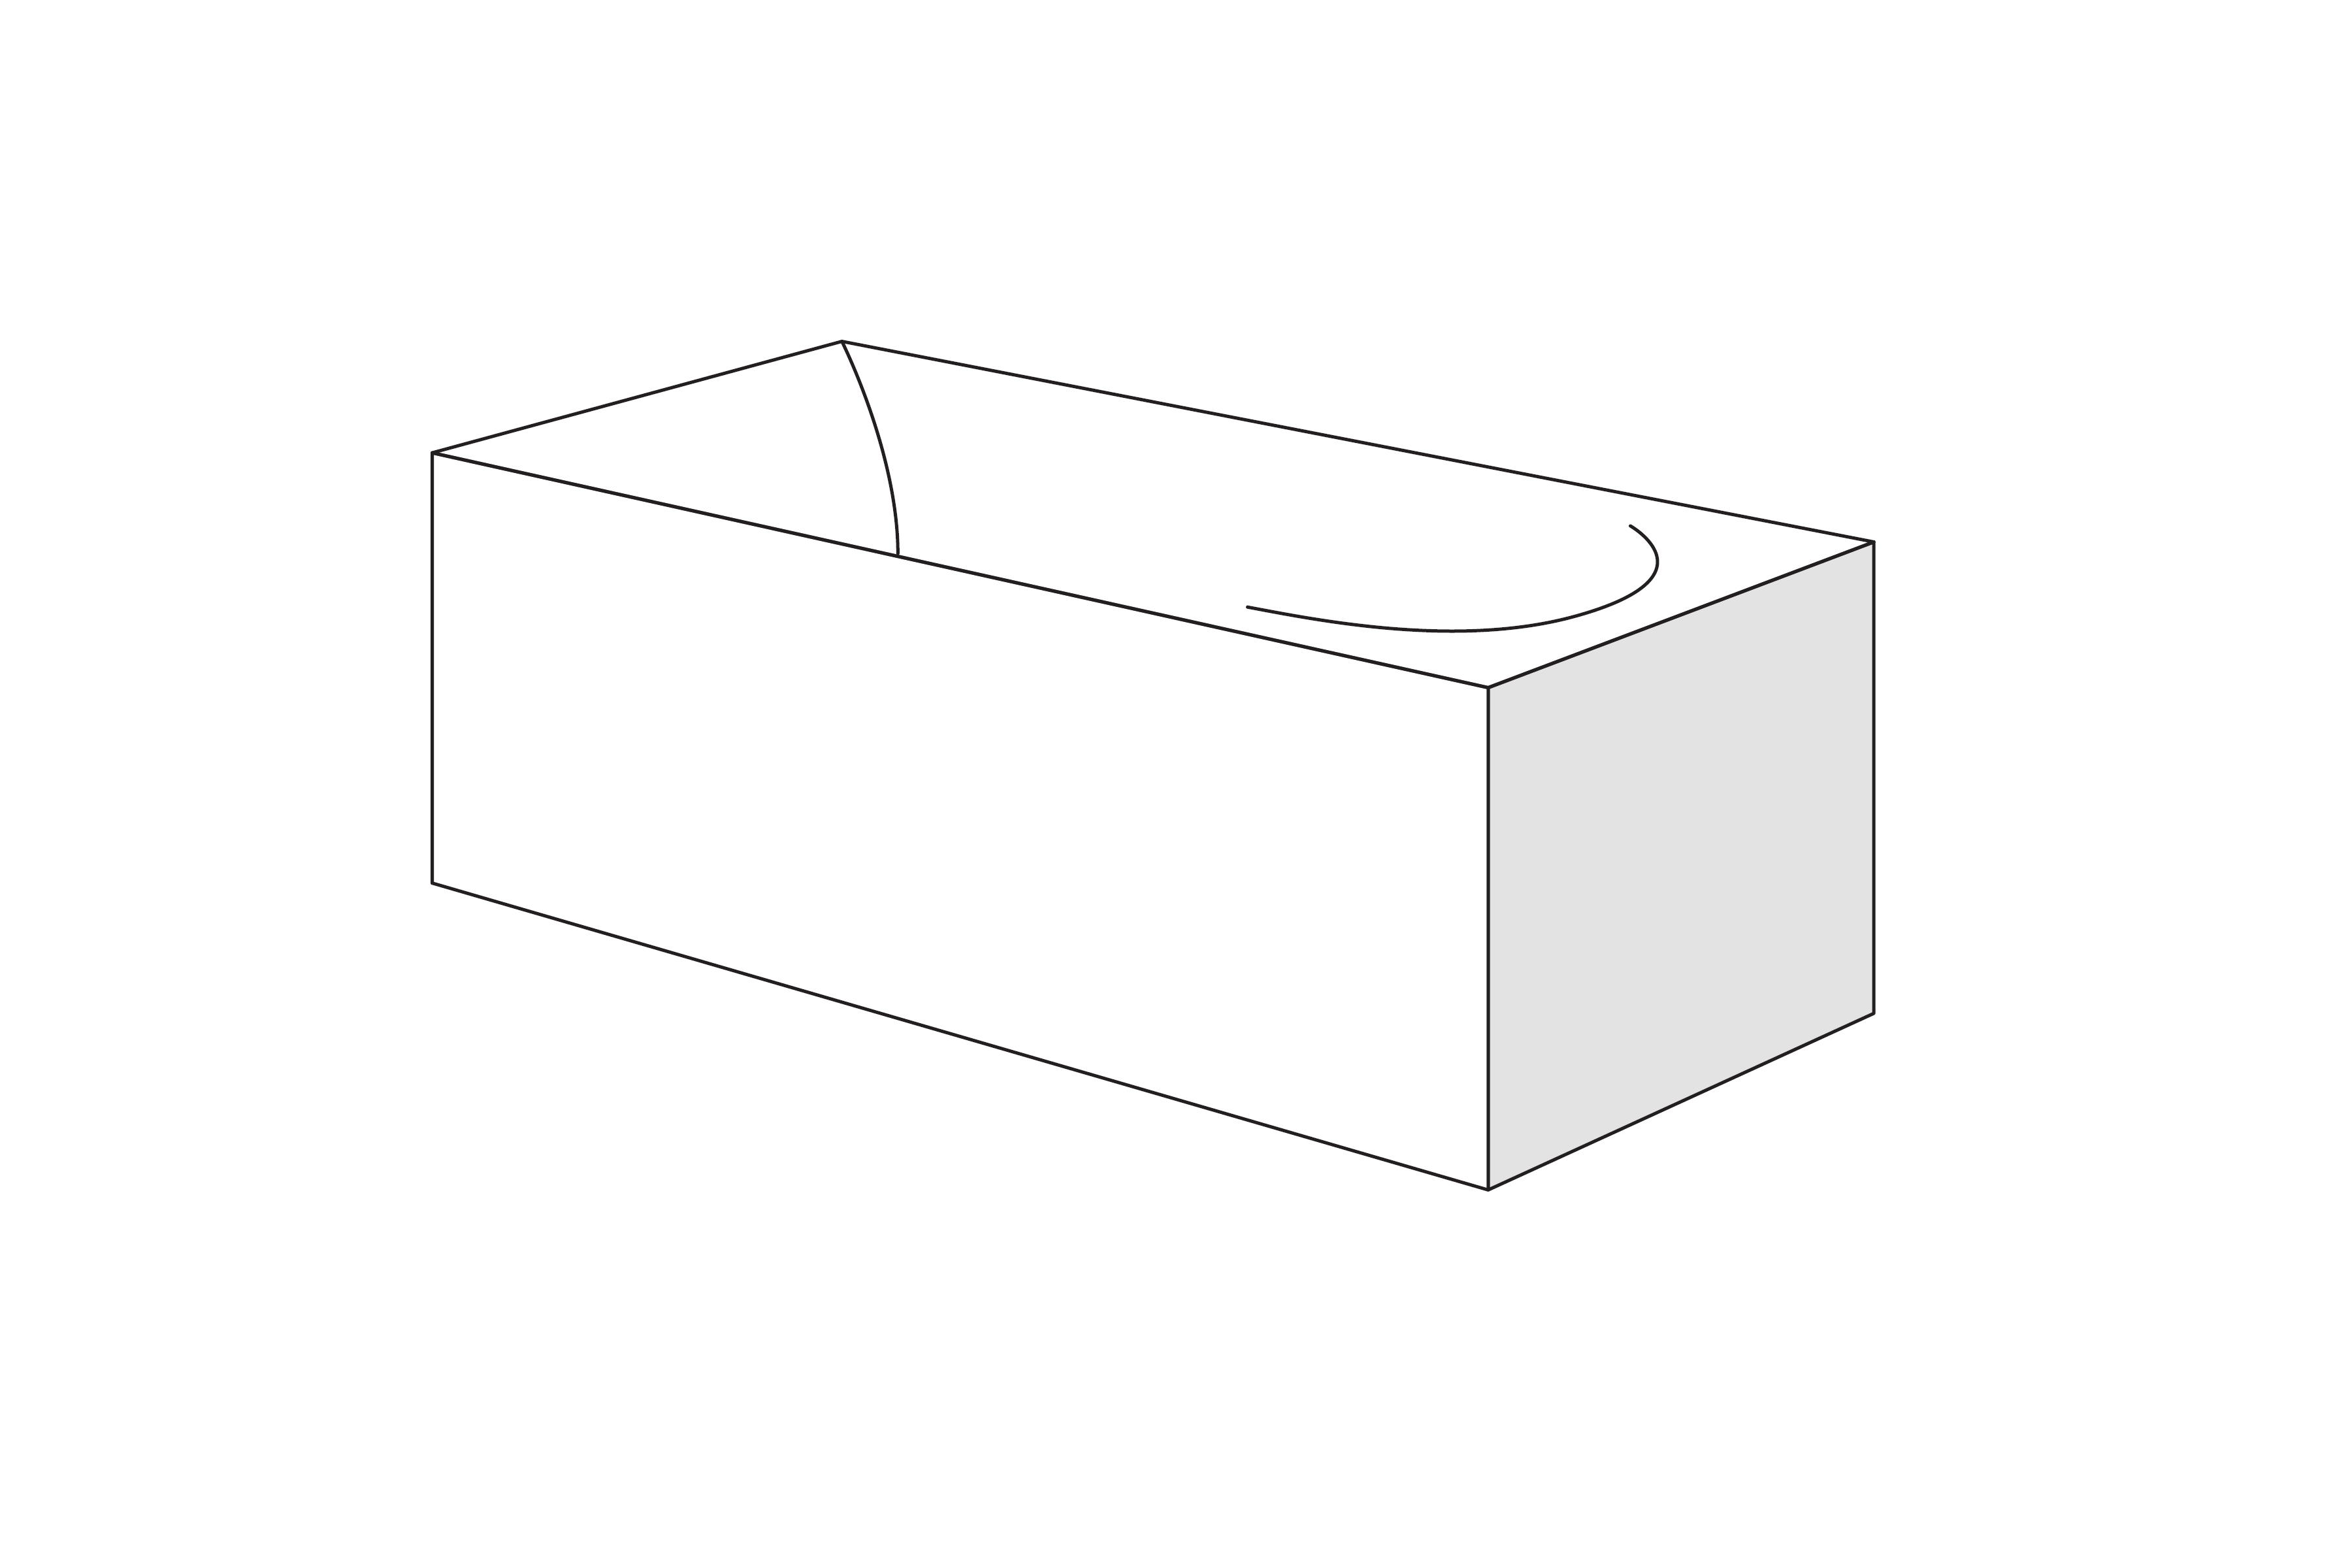 Panou lateral Radaway pentru cazi rectangulare 80cm h58cm imagine